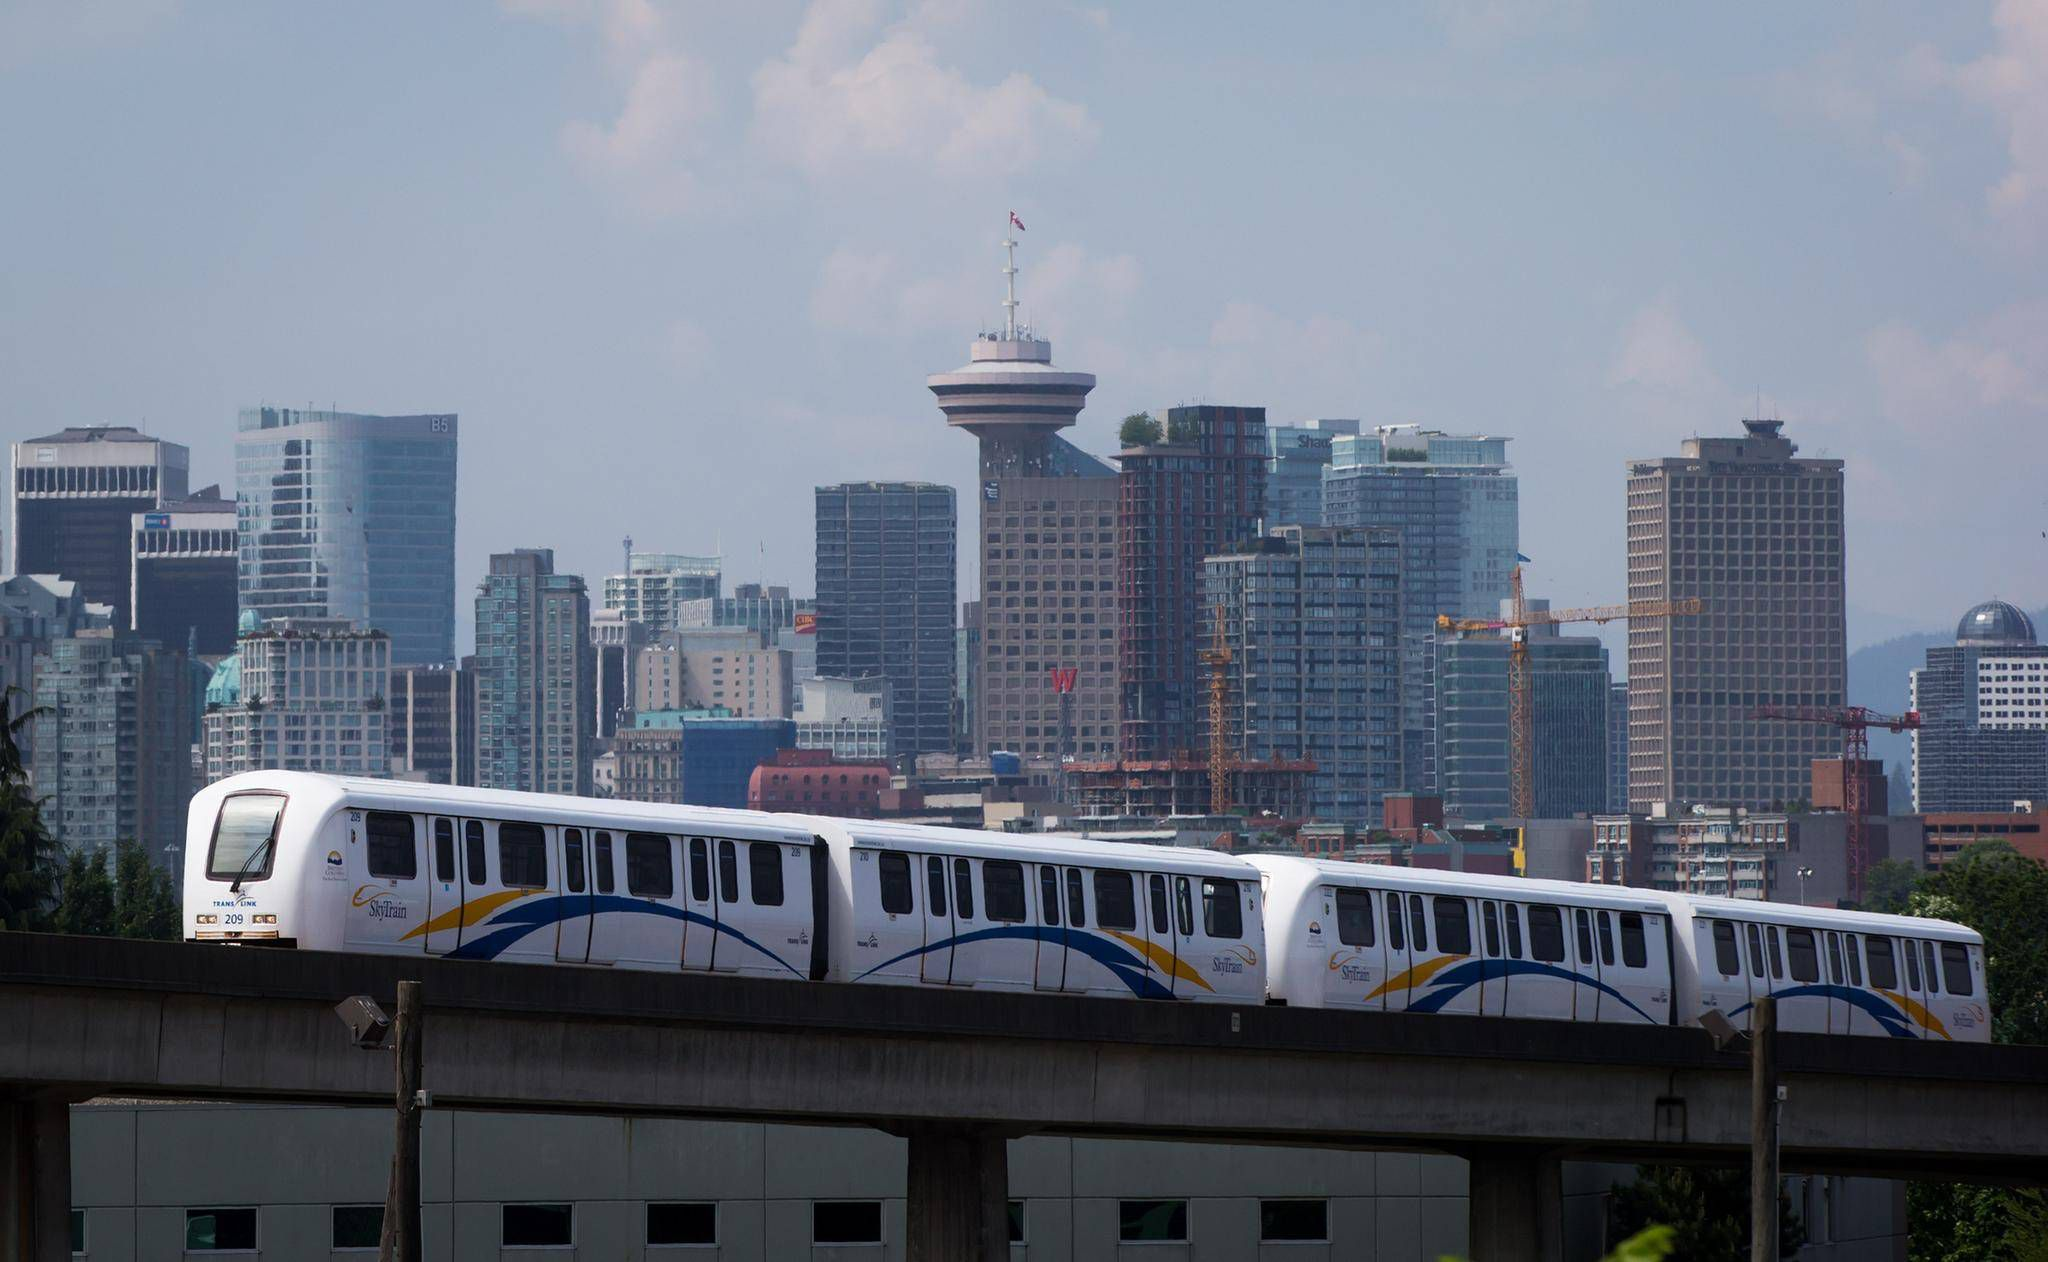 Vancouver Skytrain and skyline